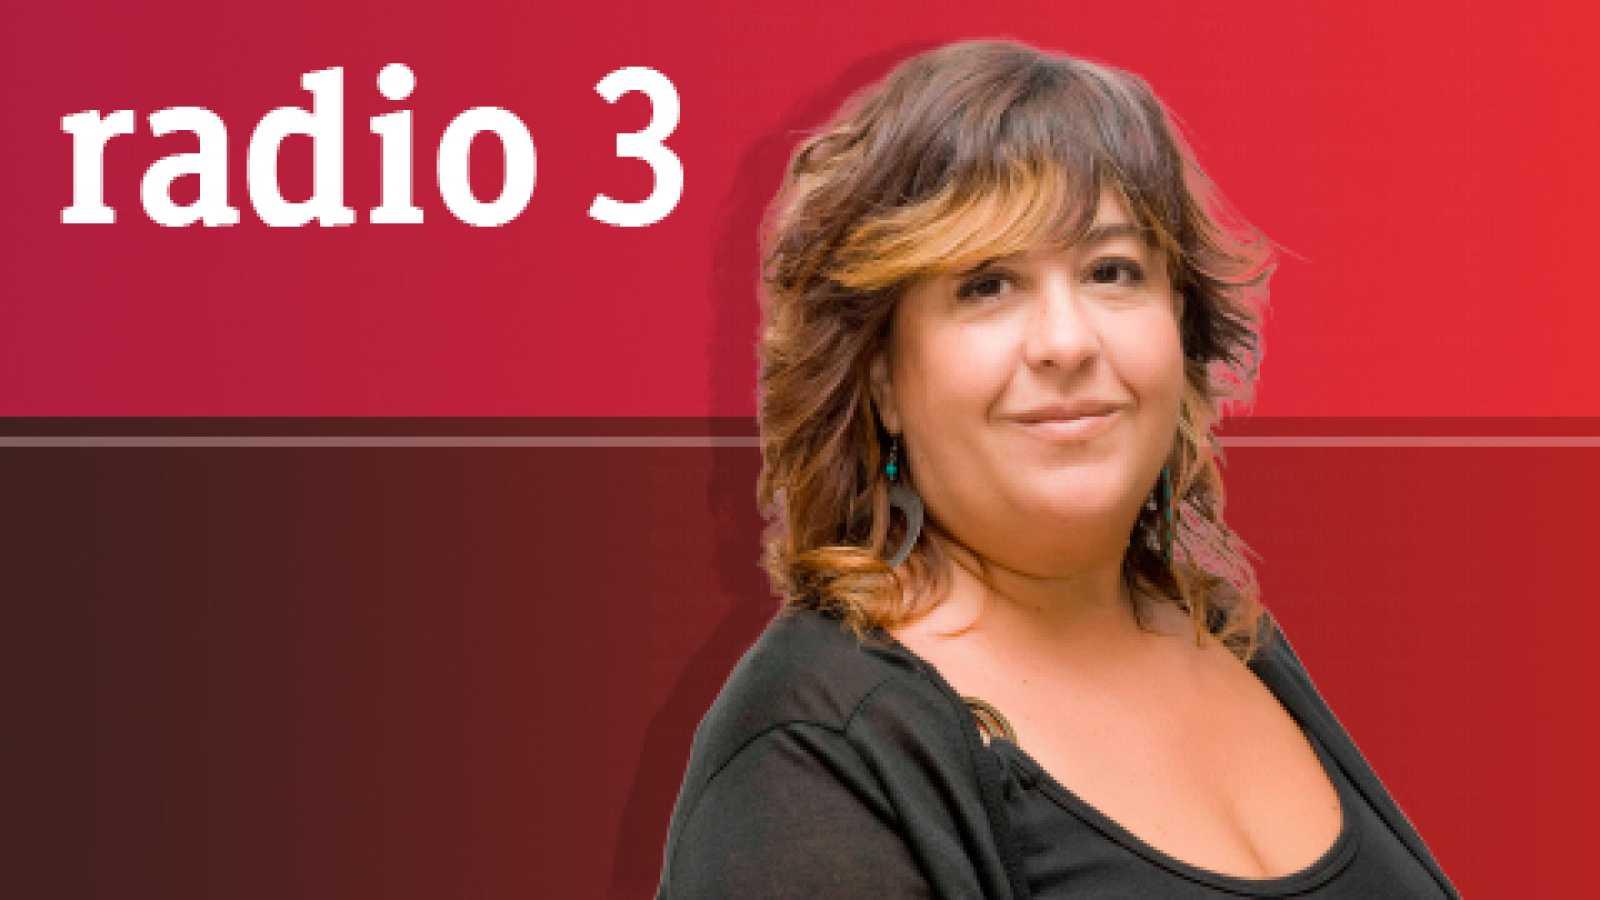 El gran quilombo - 29/09/18 - escuchar ahora